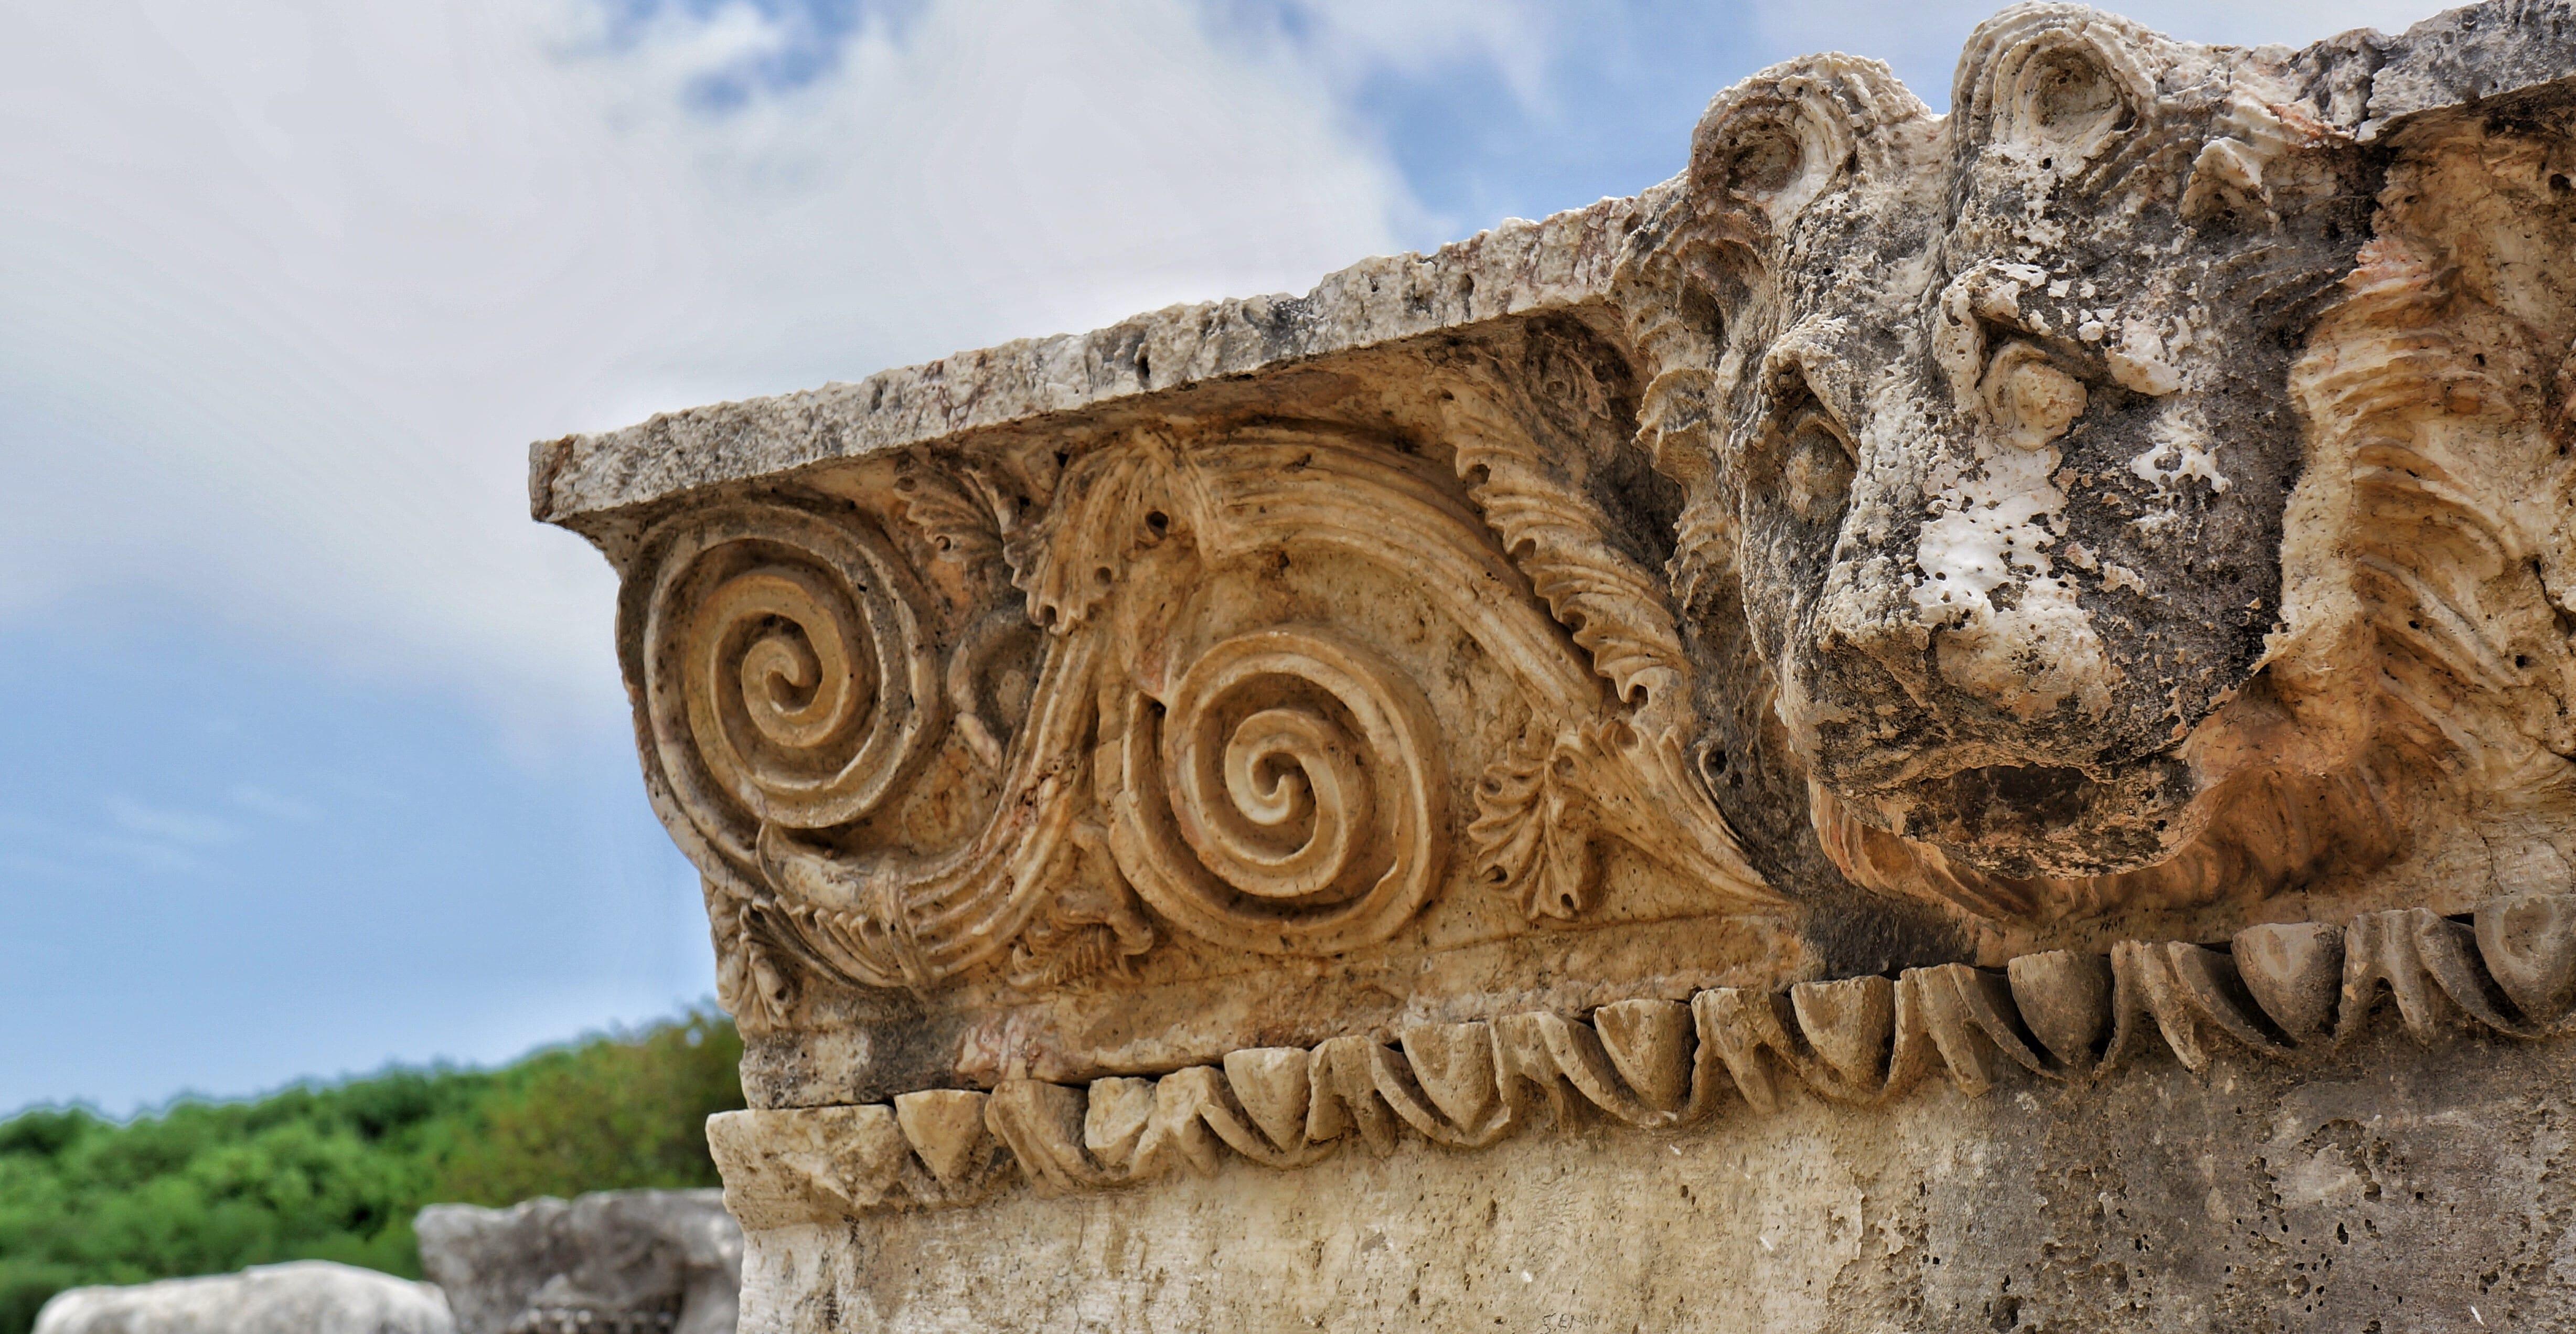 kamenný reliéf s podobiznou lví hlavy s rostlinnými ornamenty na kamenné římse Lýkijského chrámu Xanthos